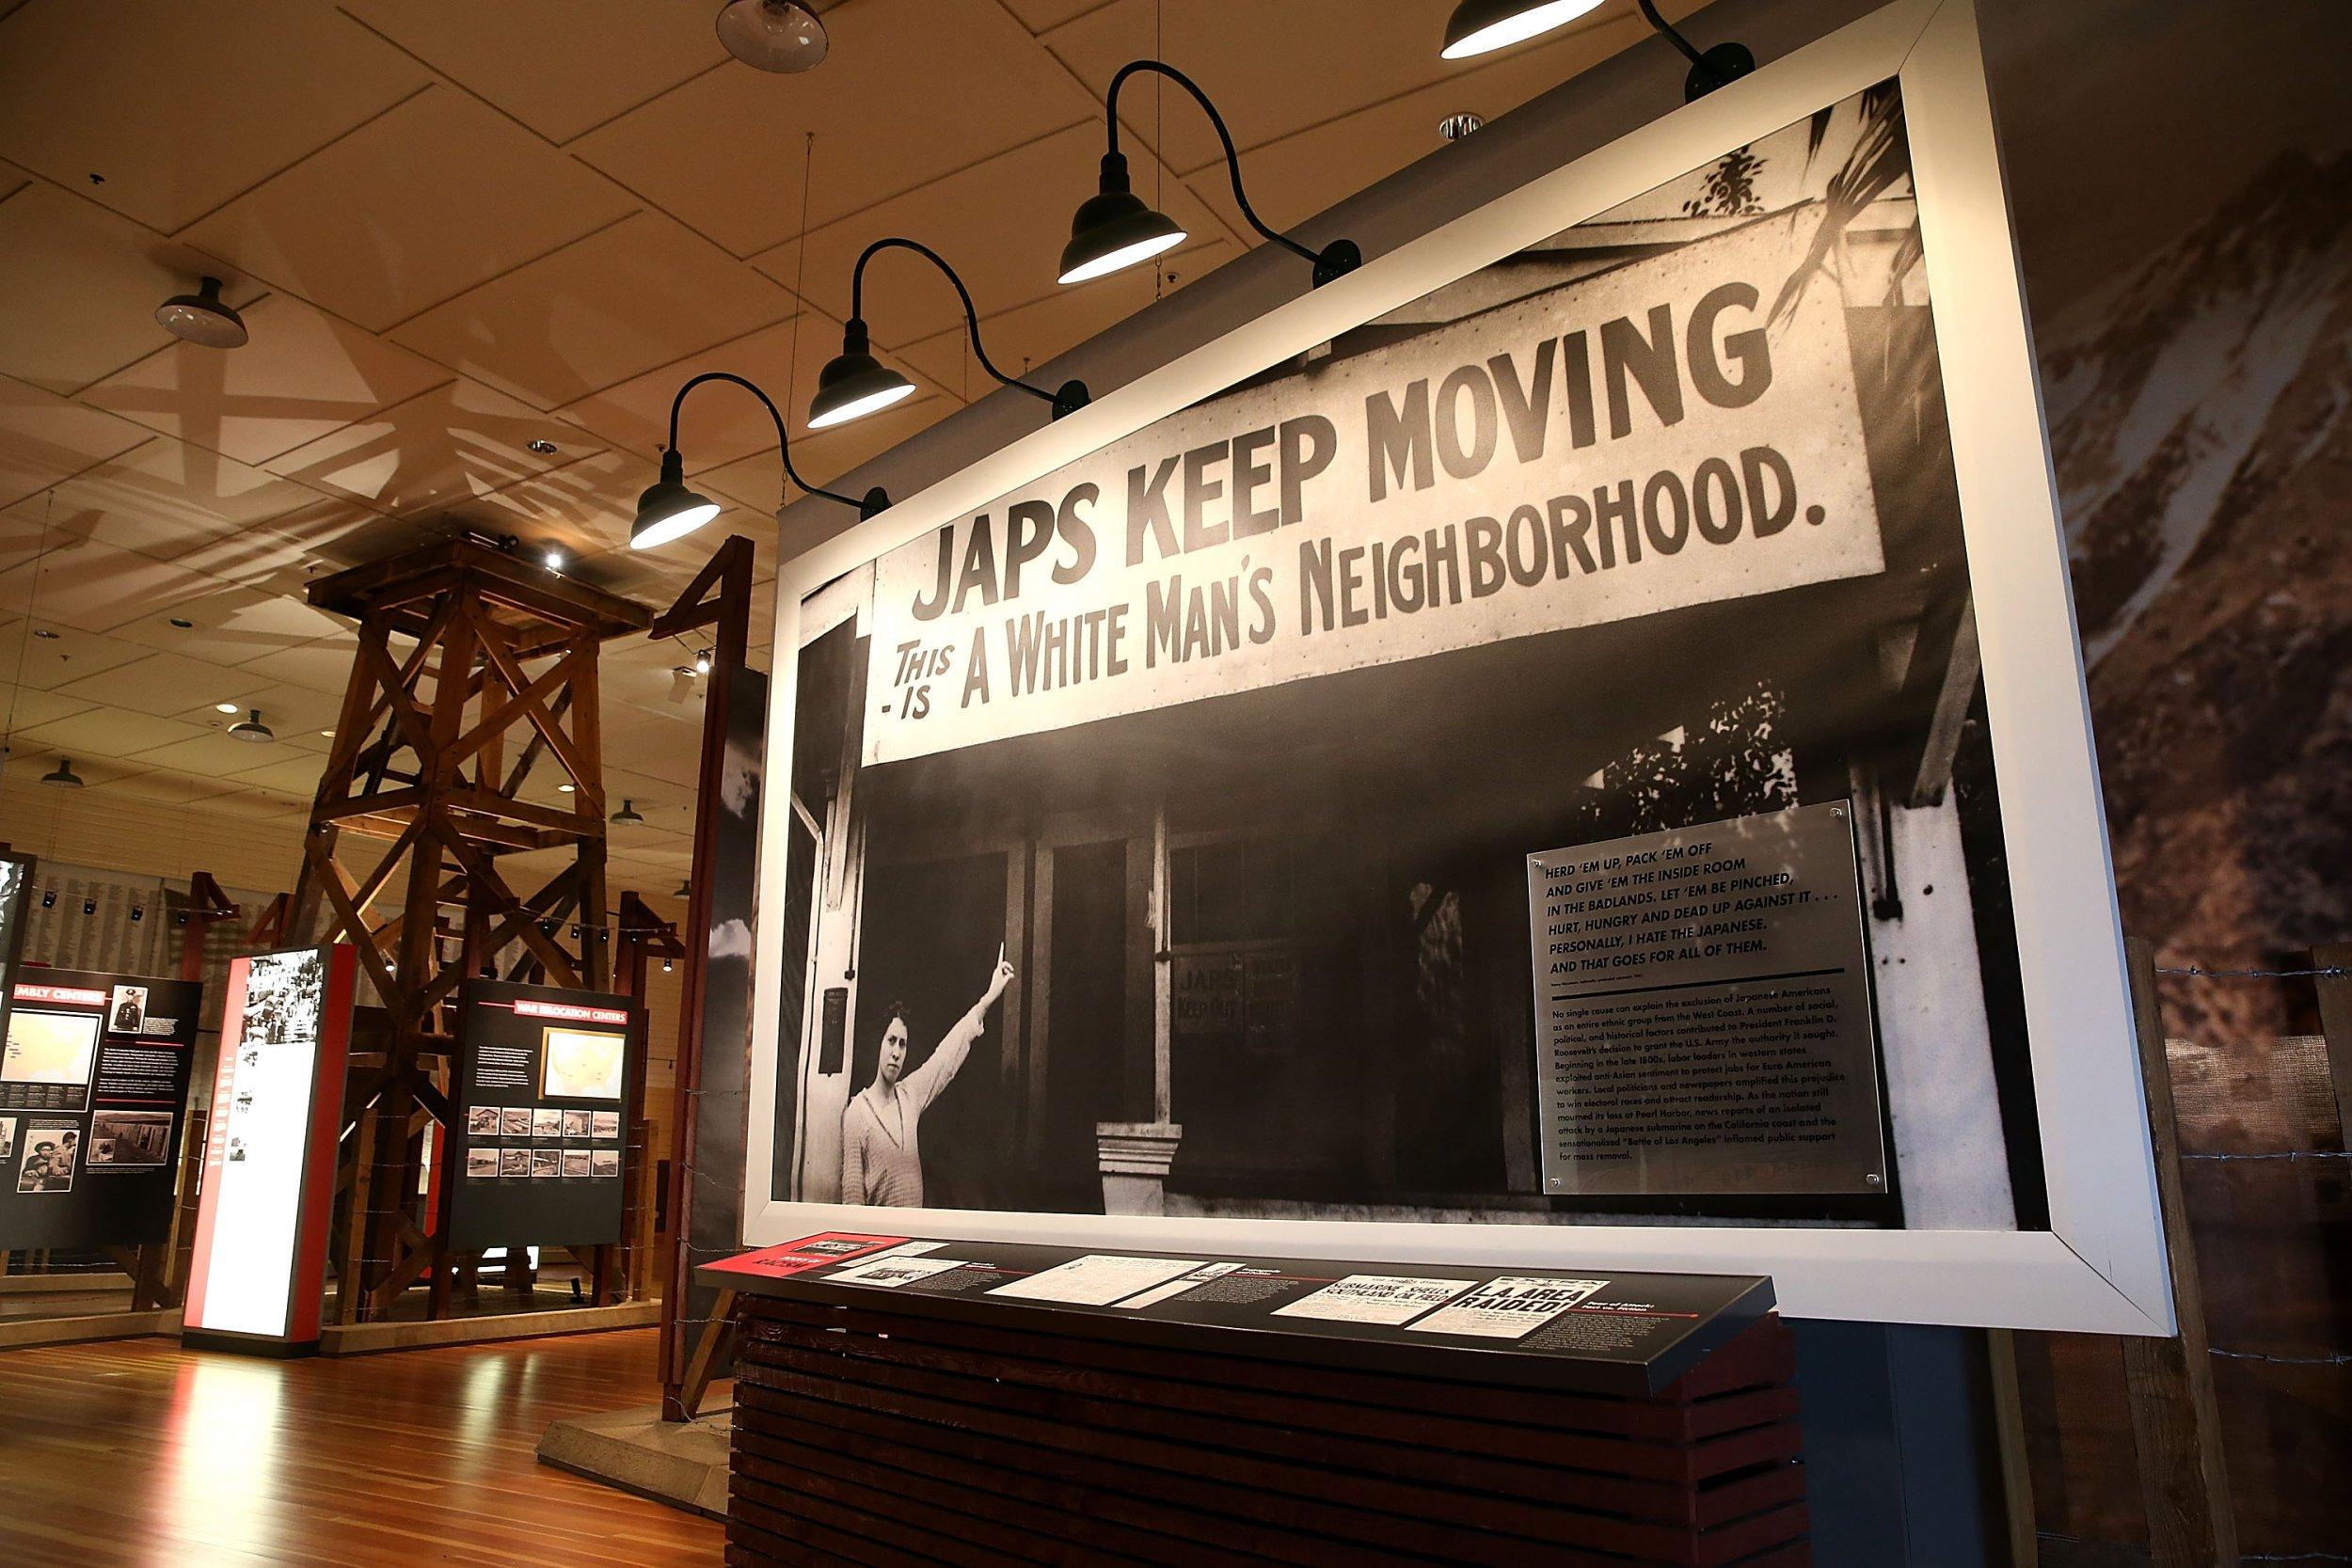 pearl harbor lessons trump s muslim ban same prejudice japanese americans faced during wwii. Black Bedroom Furniture Sets. Home Design Ideas